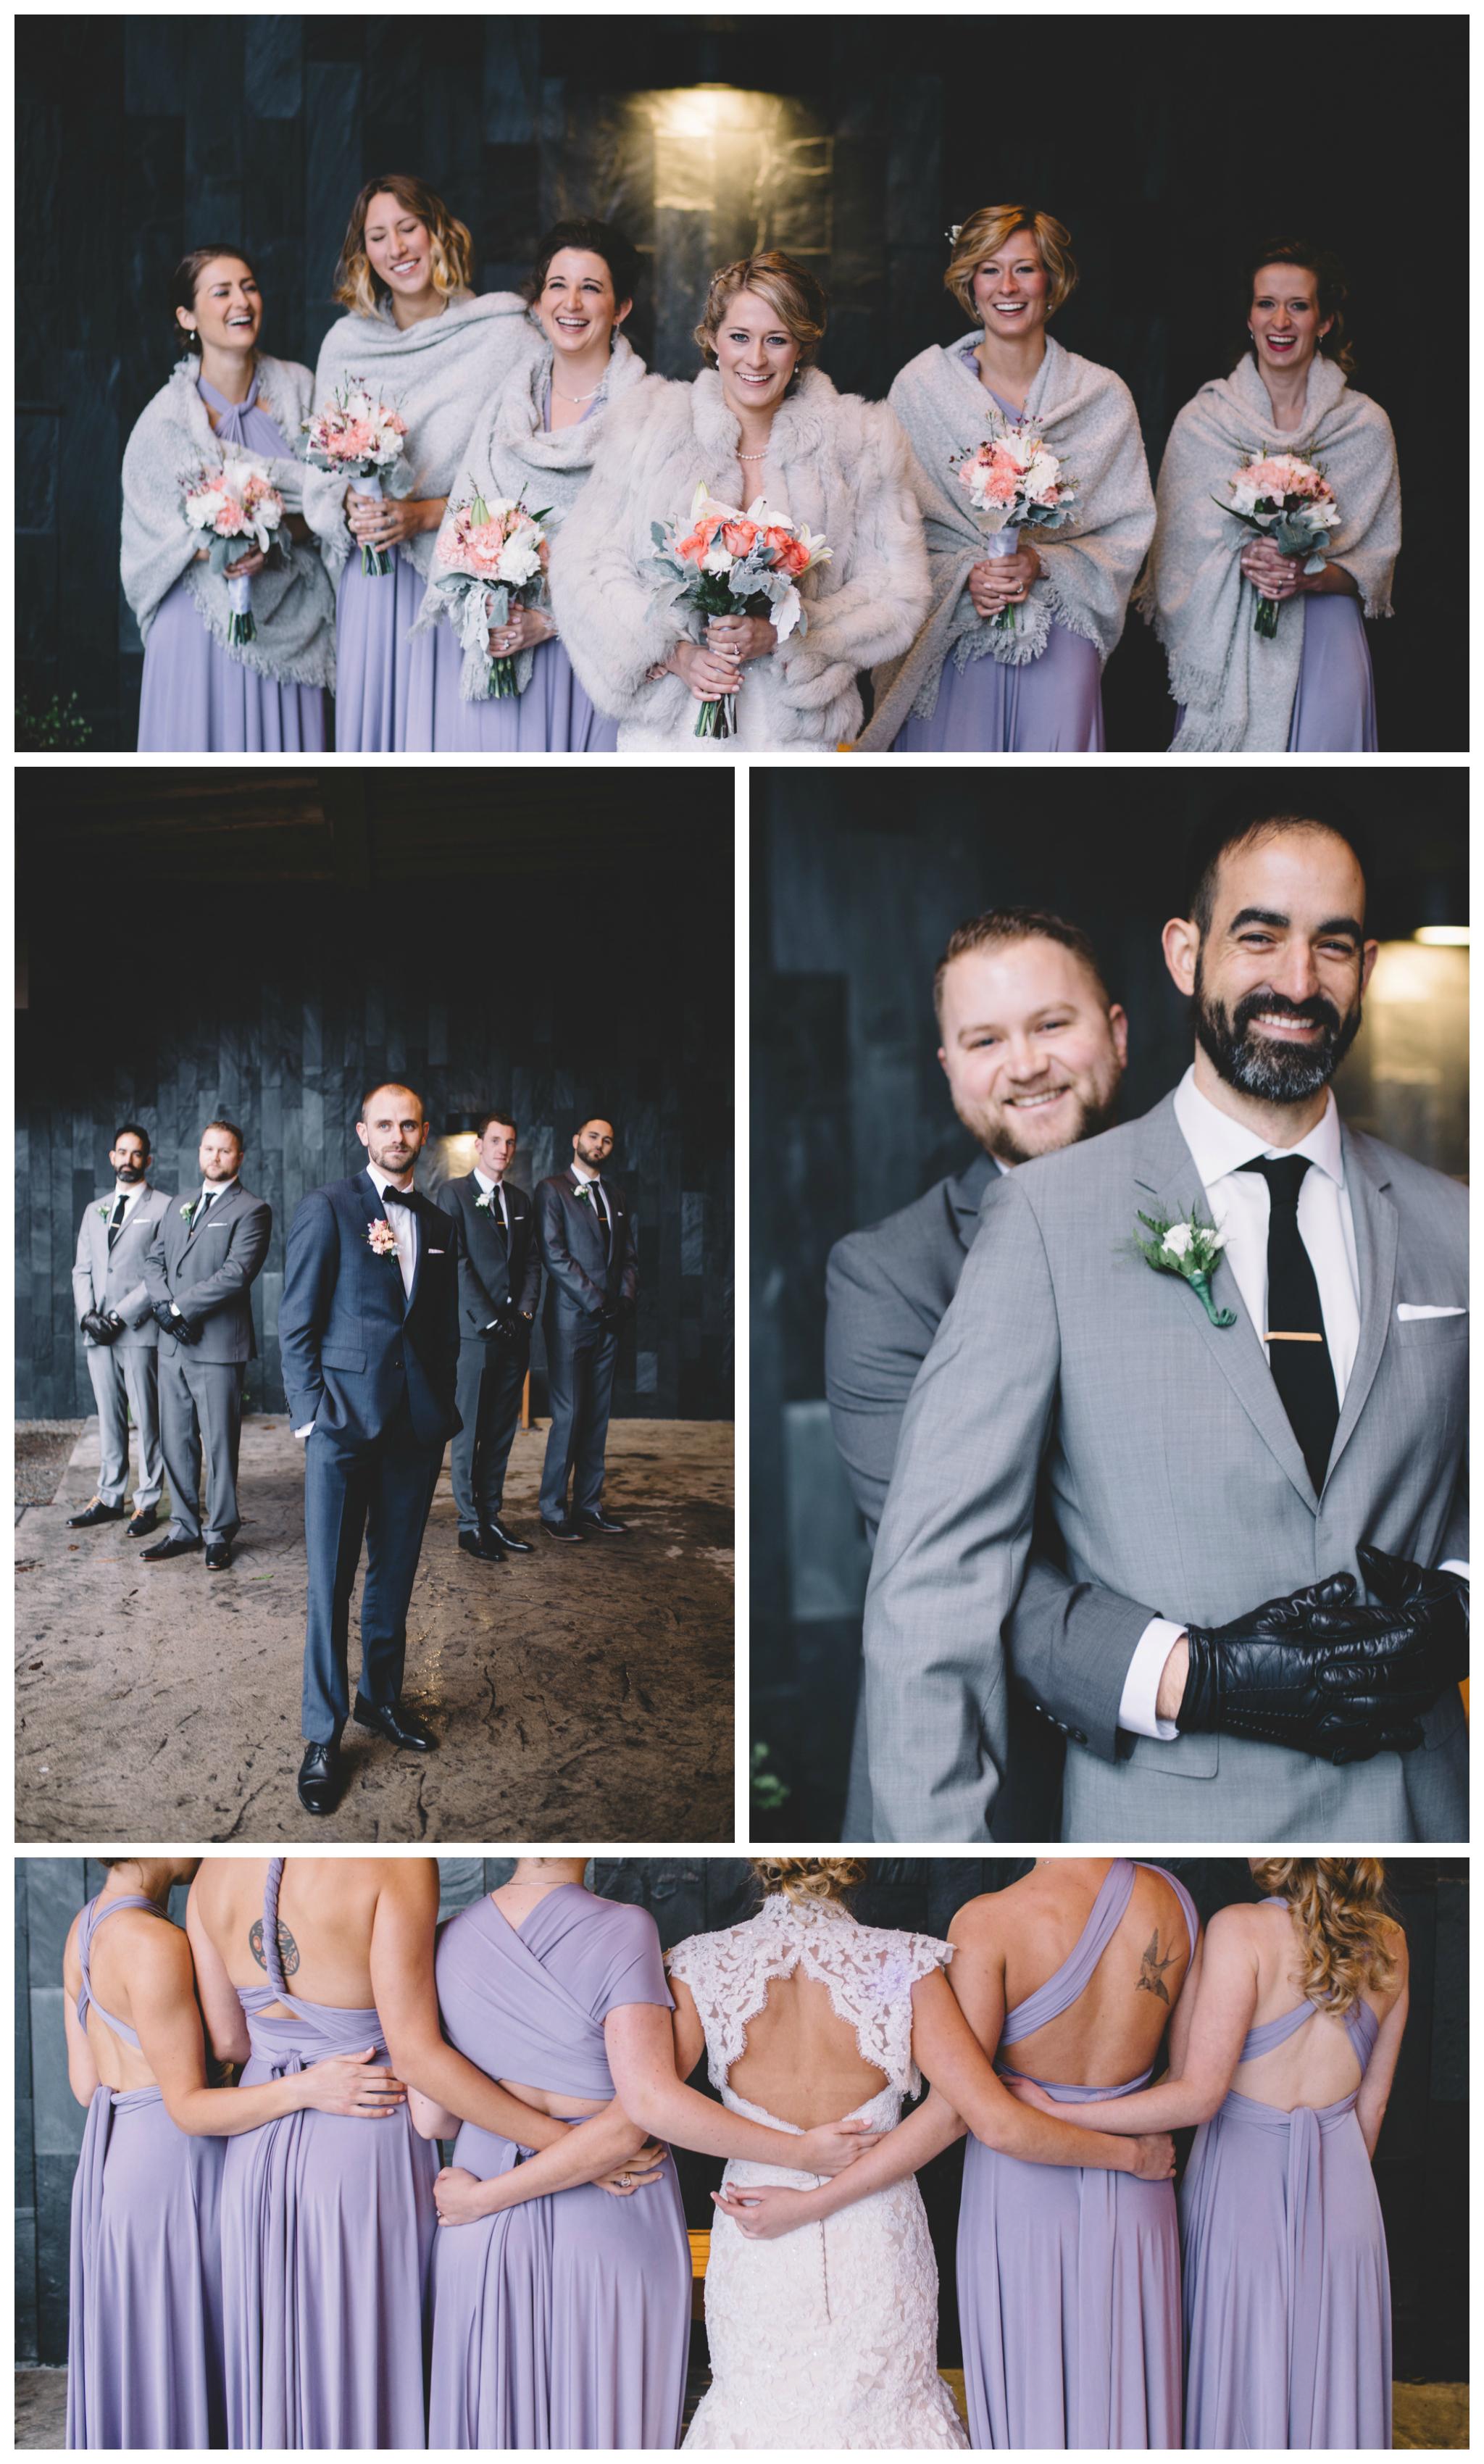 frick-wedding-9.jpg